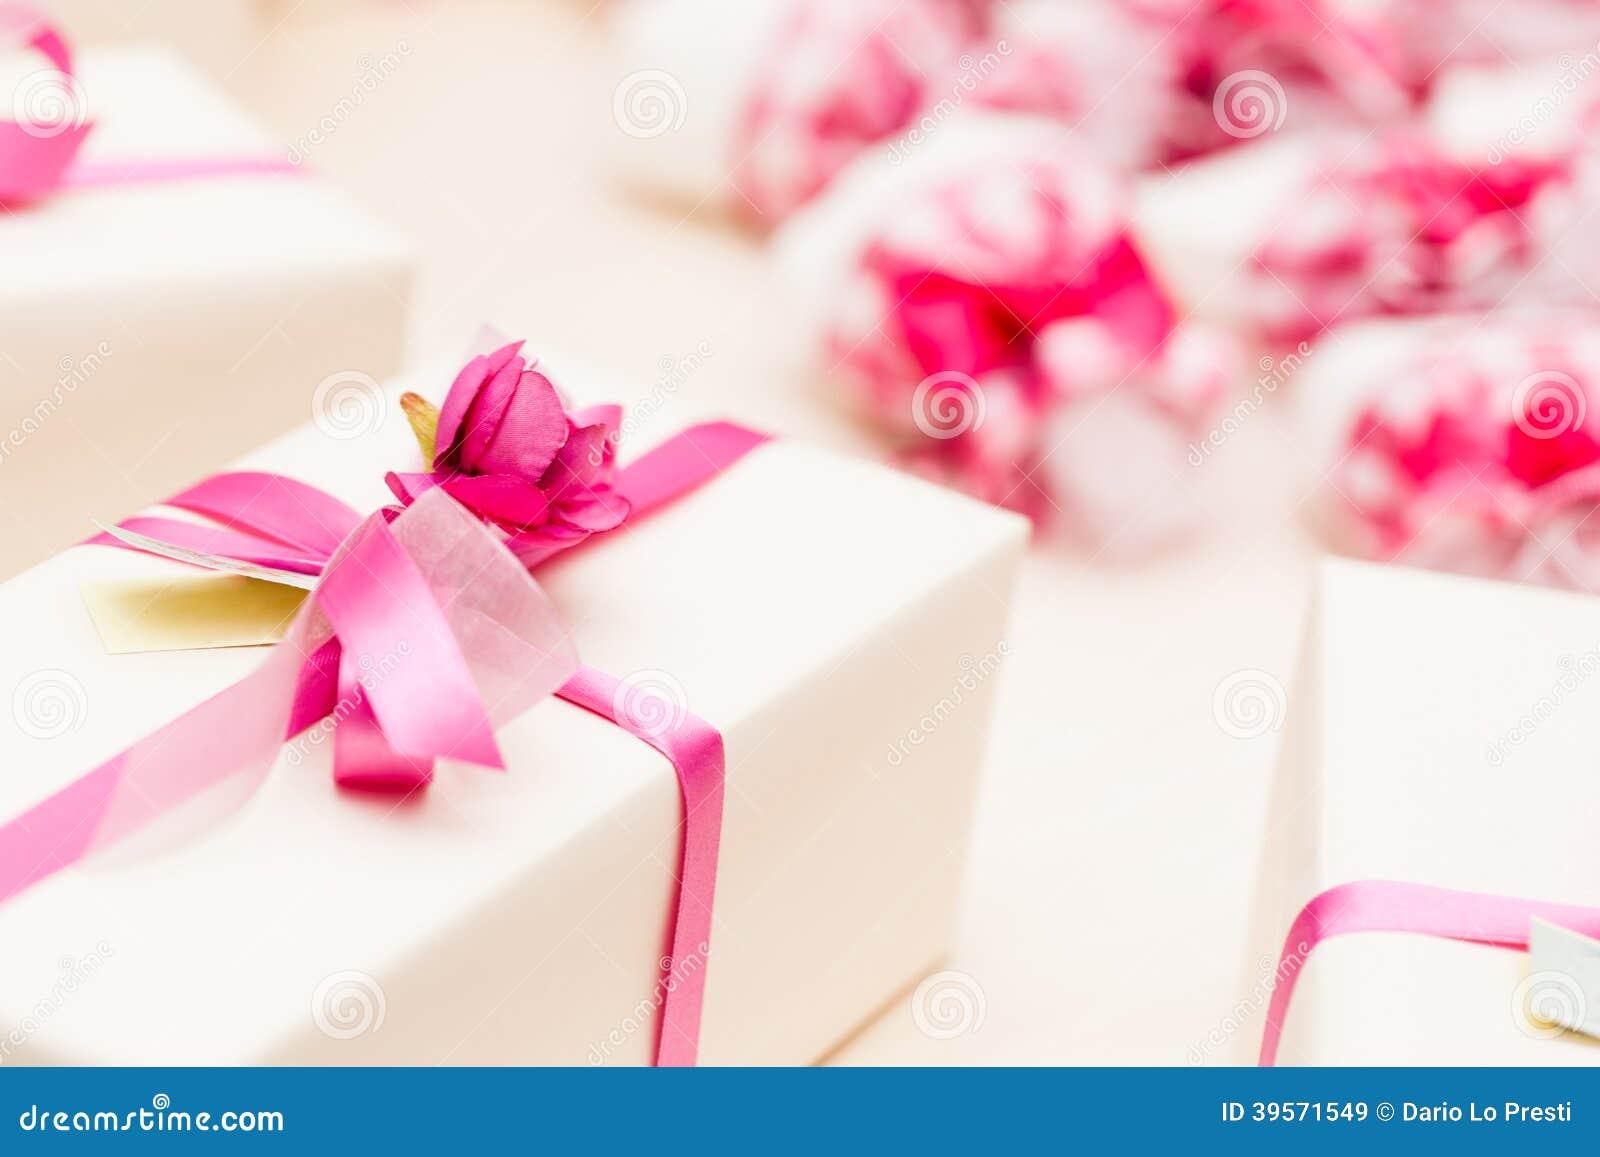 Beautiful Wedding Gifts: Wrapped Wedding Gifts Stock Photo